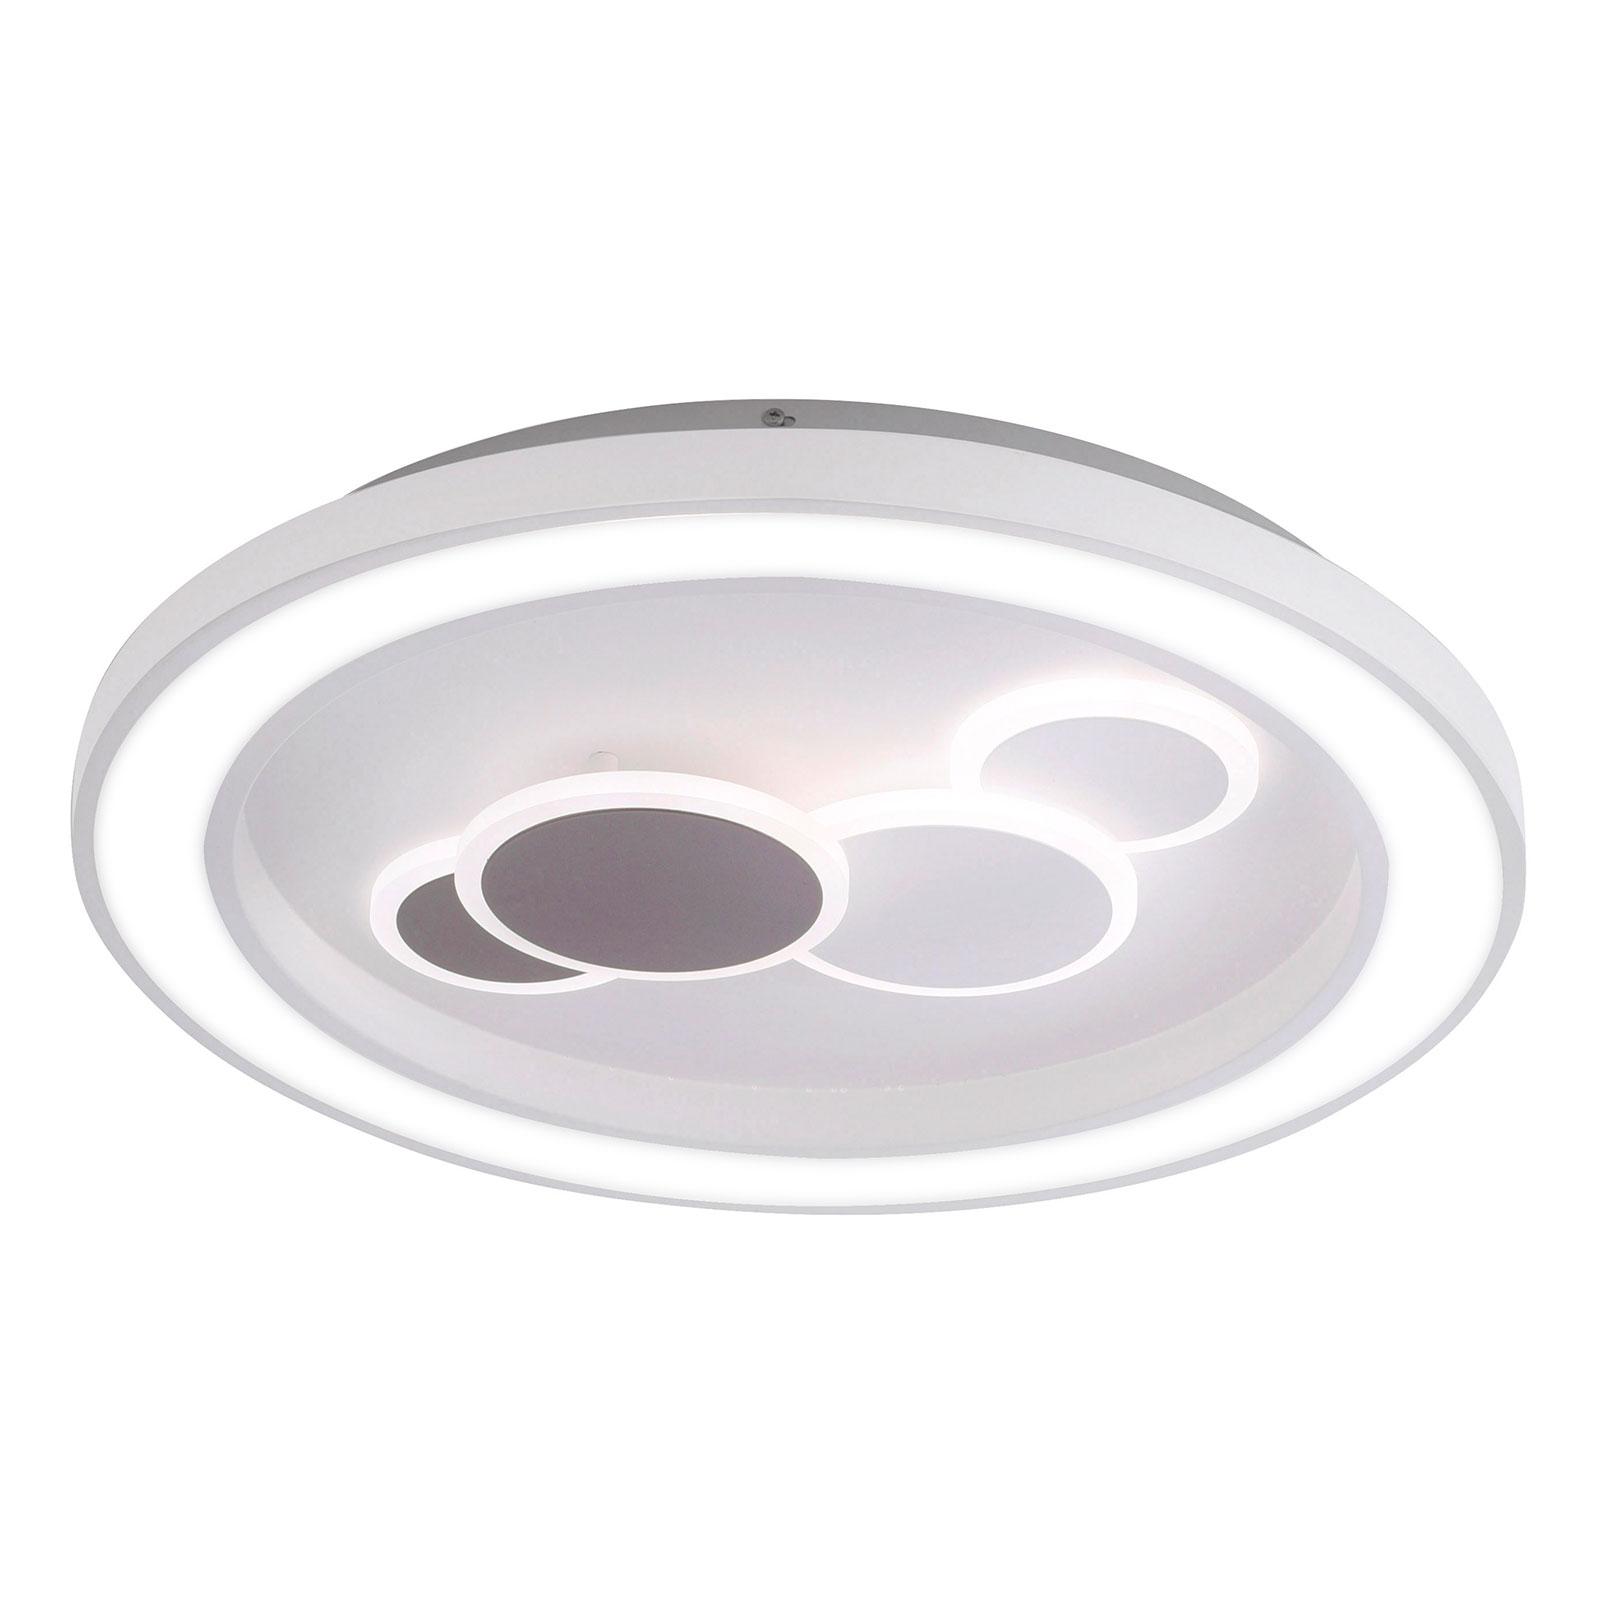 Paul Neuhaus Eliza LED plafondlamp rond